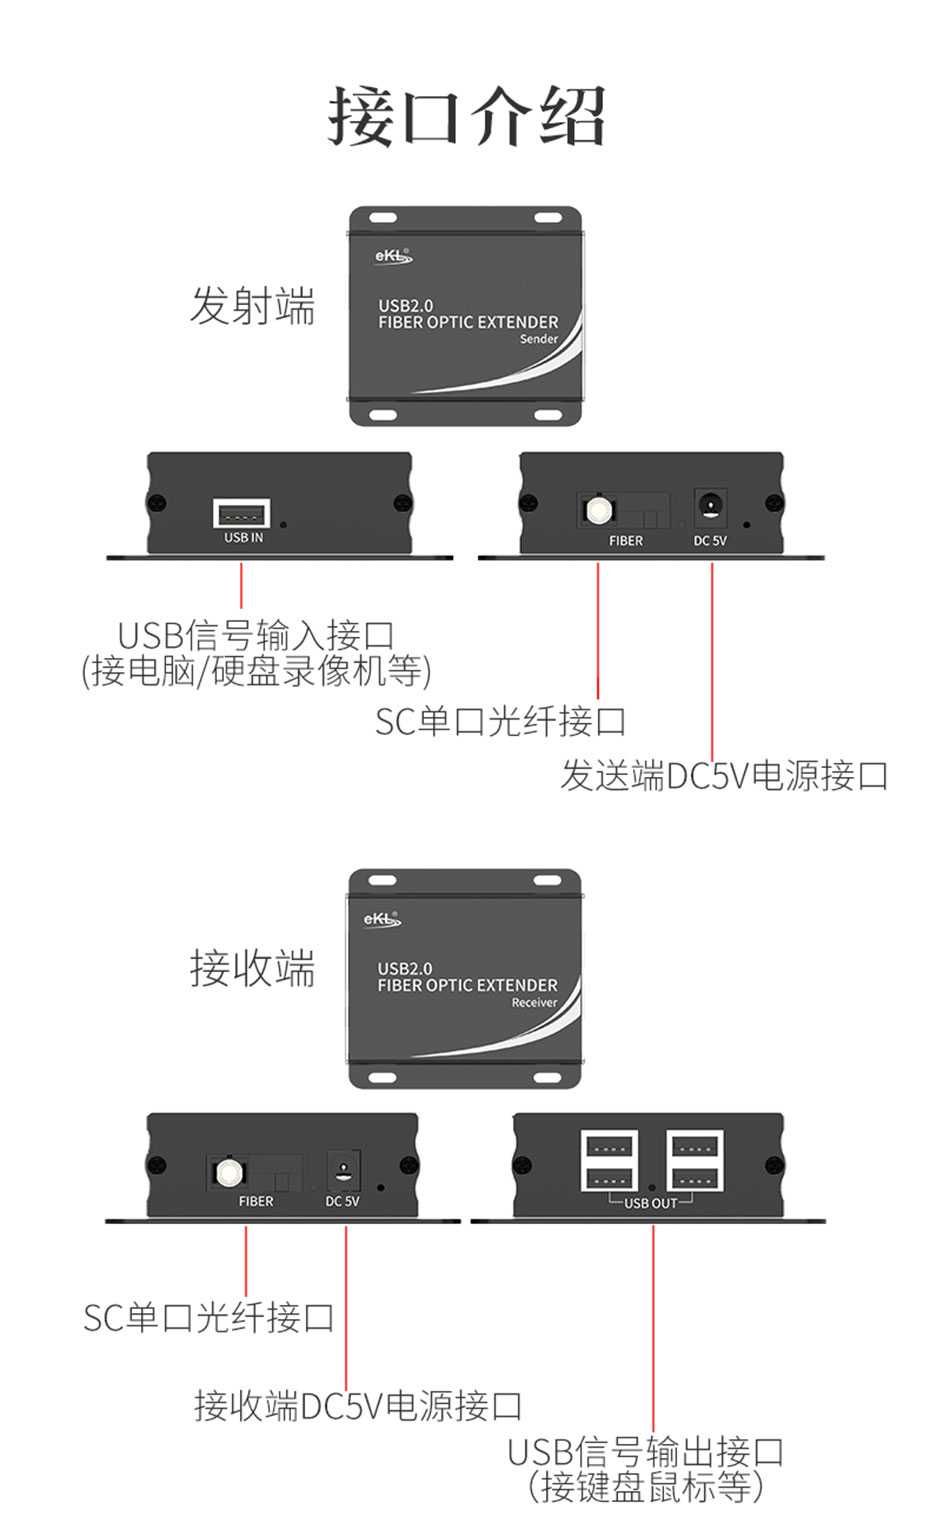 USB2.0光端机UF01接口介绍